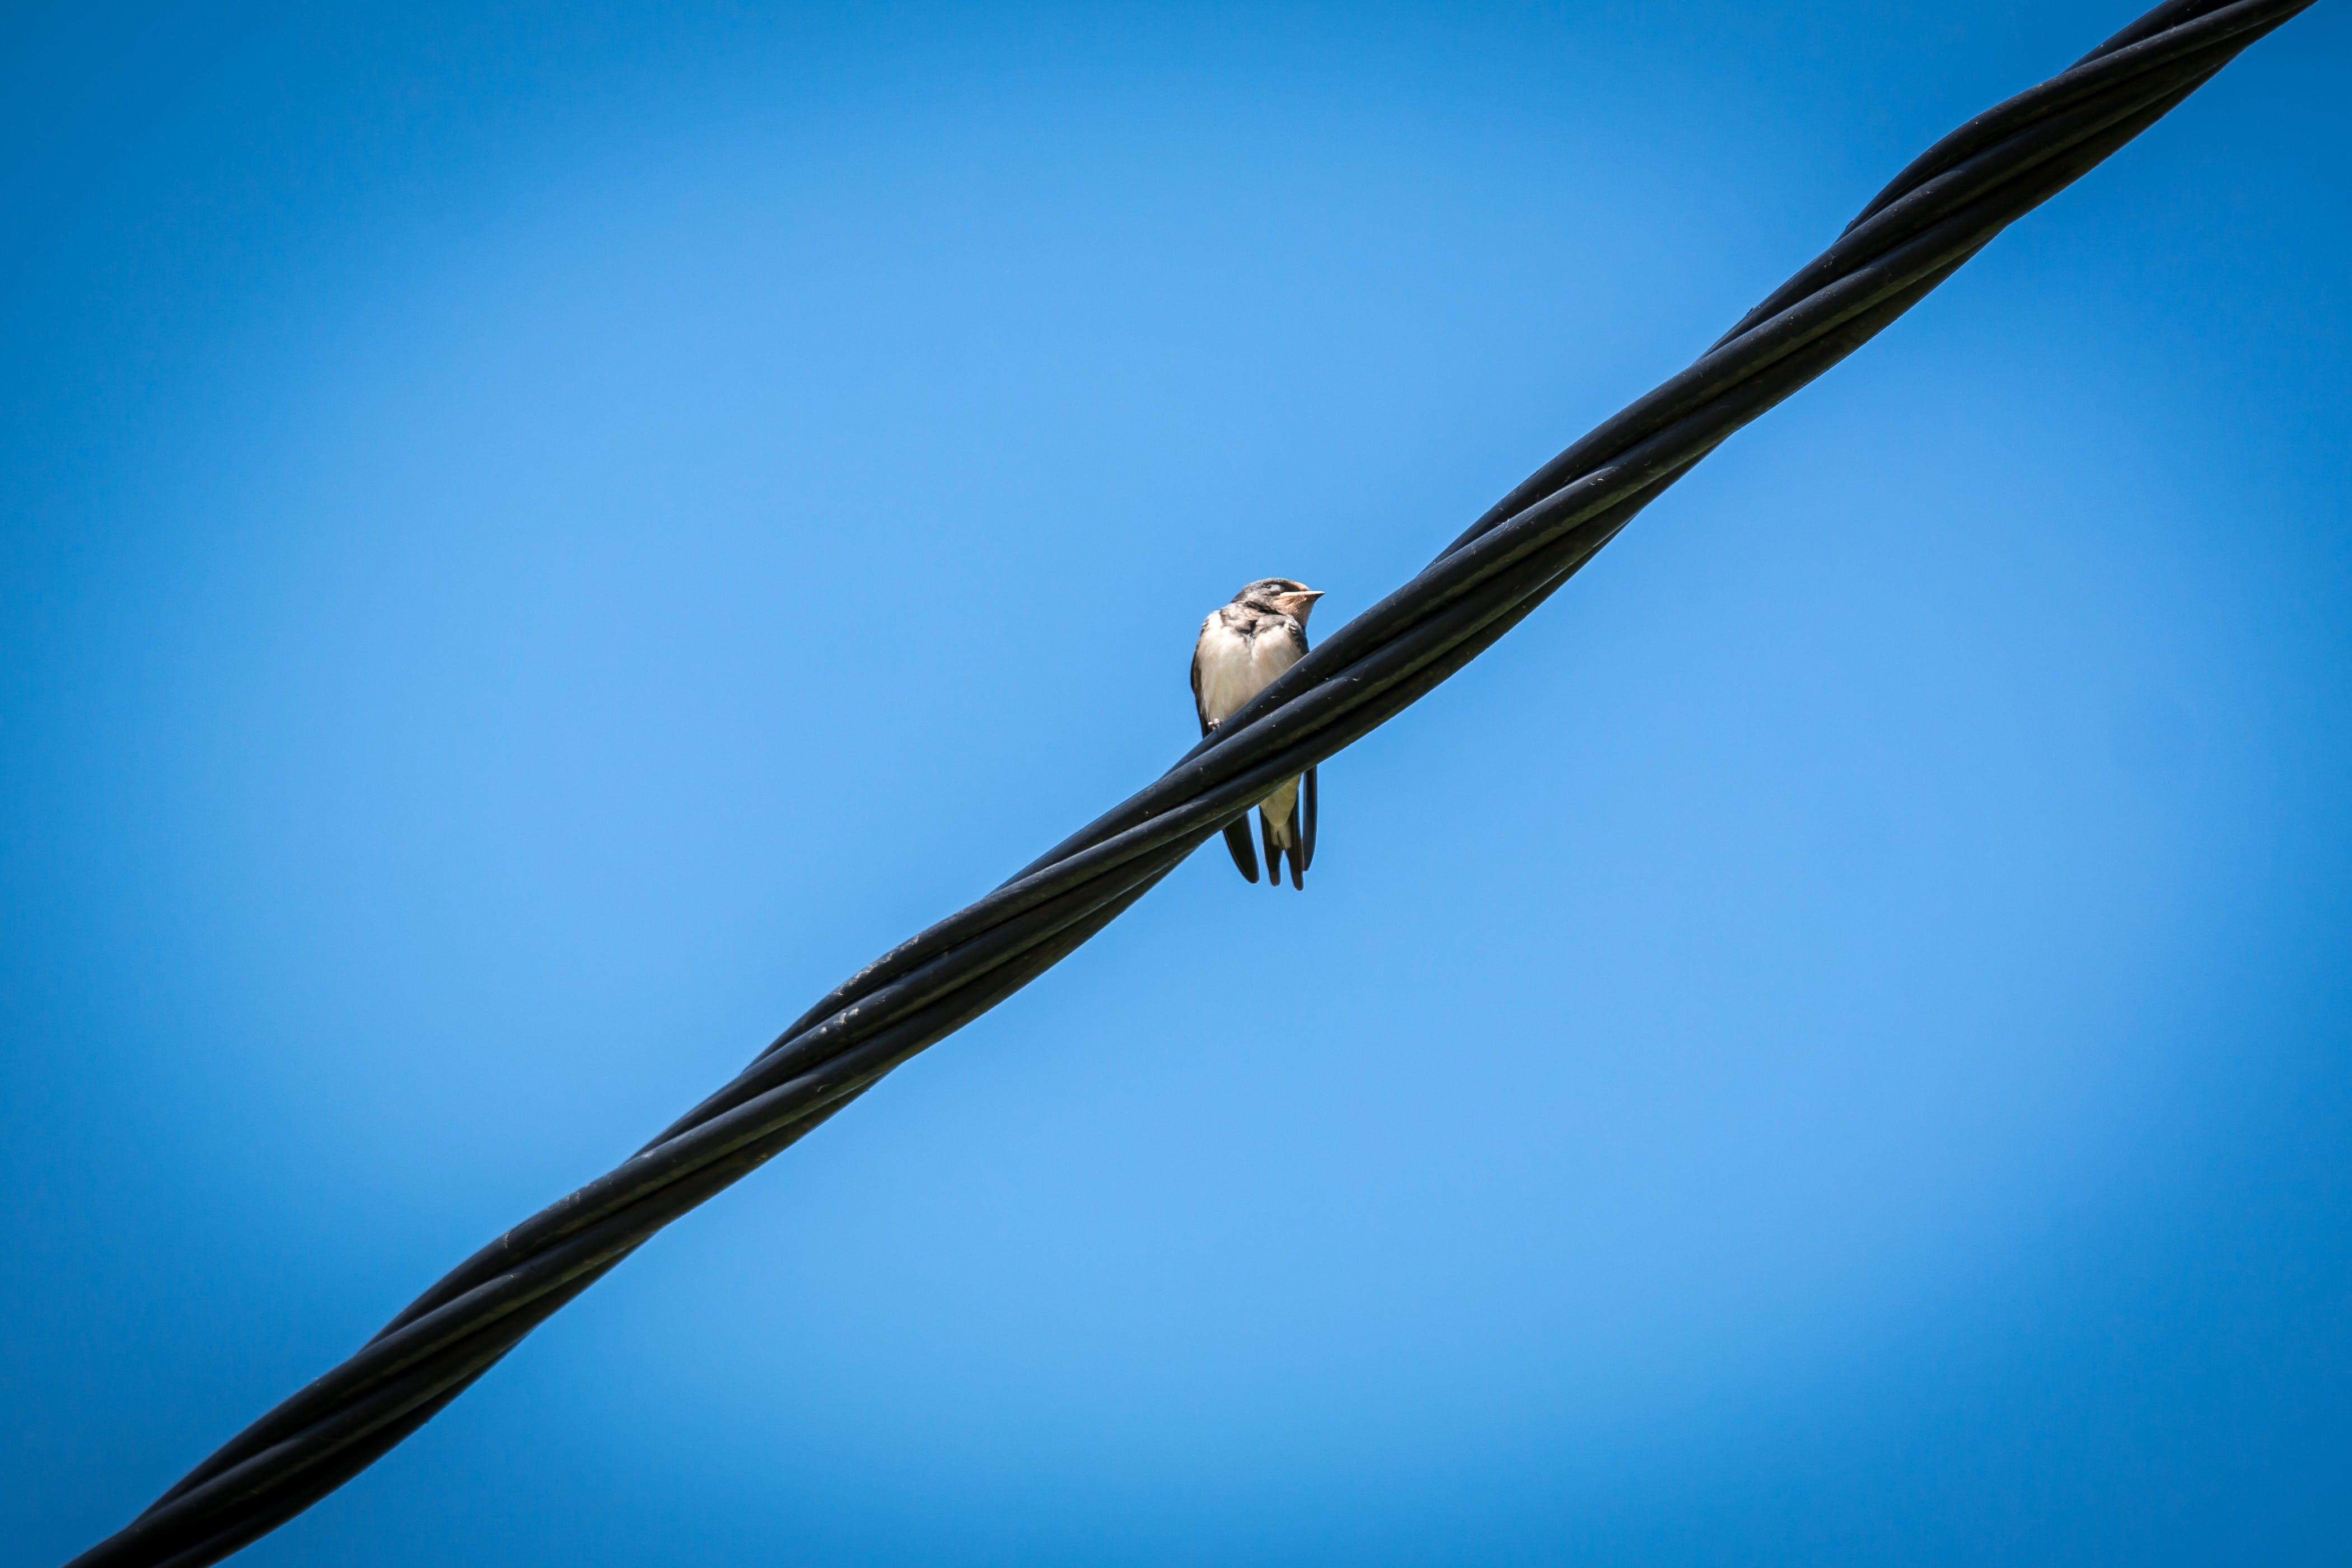 White Bird on Black Electricity Wire